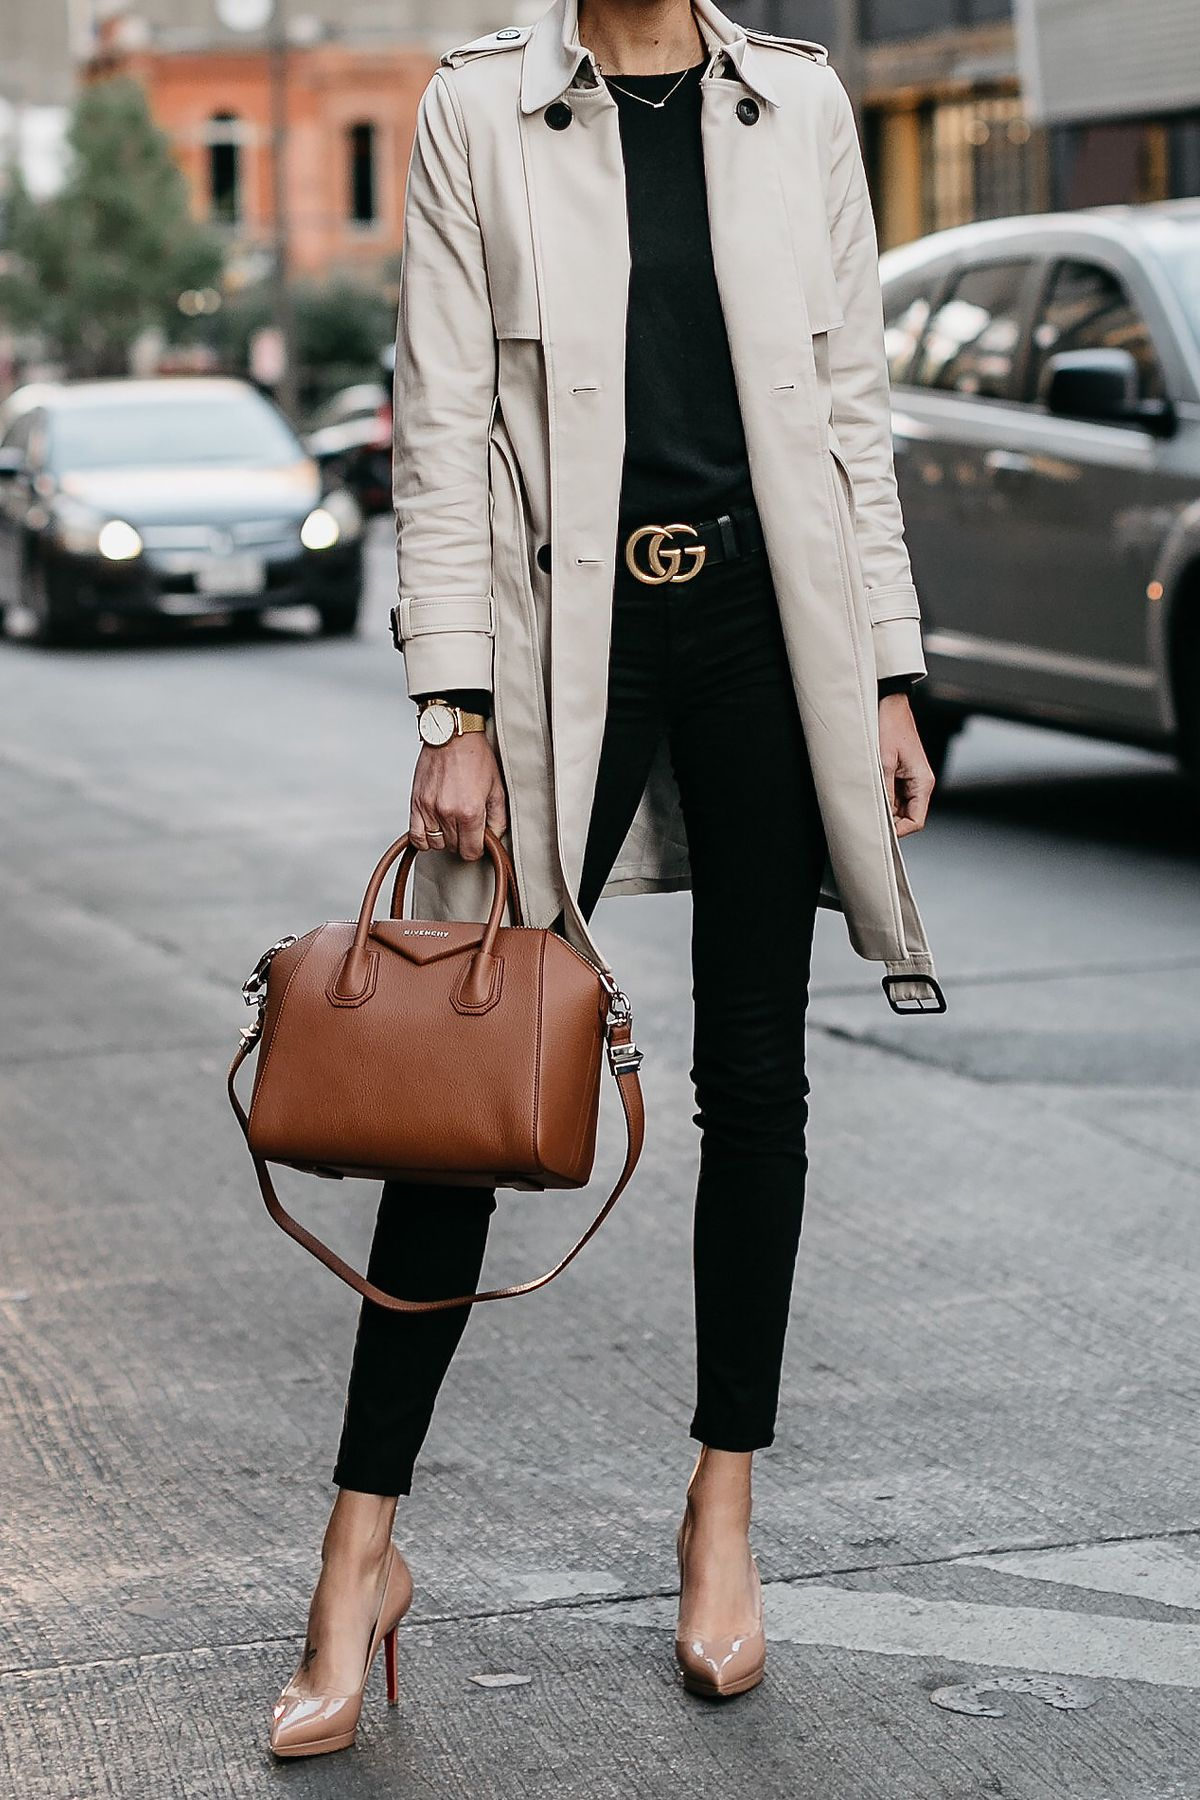 4aea6846634b ... Sweater Black Skinny Jeans Gucci Marmont Belt Nude Pumps Givenchy  Antigona Cognac Satchel Fashion Jackson Dallas Blogger Fashion Blogger  Street Style